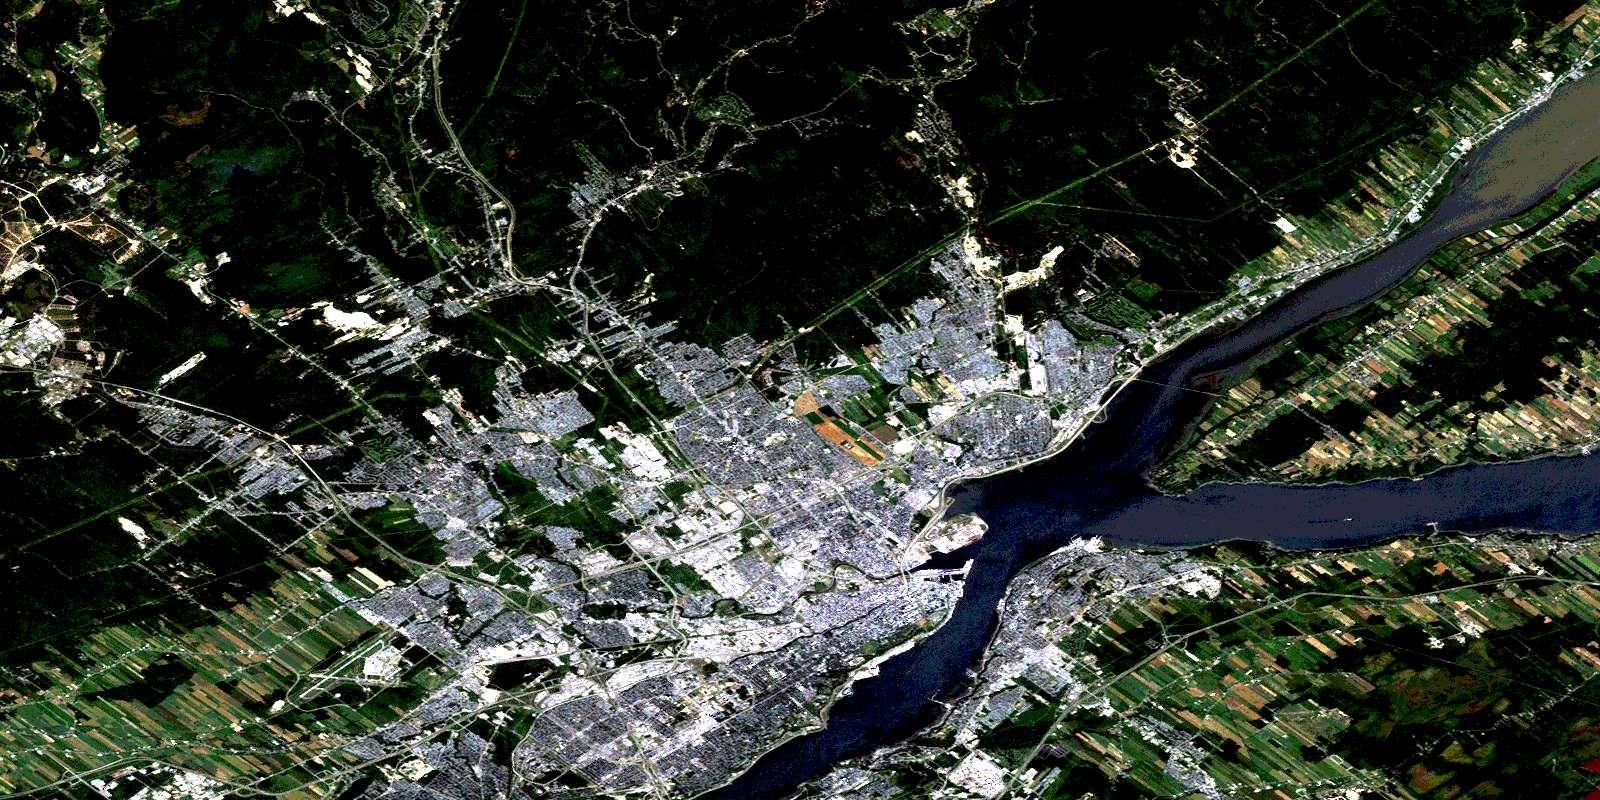 Quebec Qc Free Satellite Image Map 021l14 At 1 50 000 Satellite Image Map Satellite Image Aerial Photo